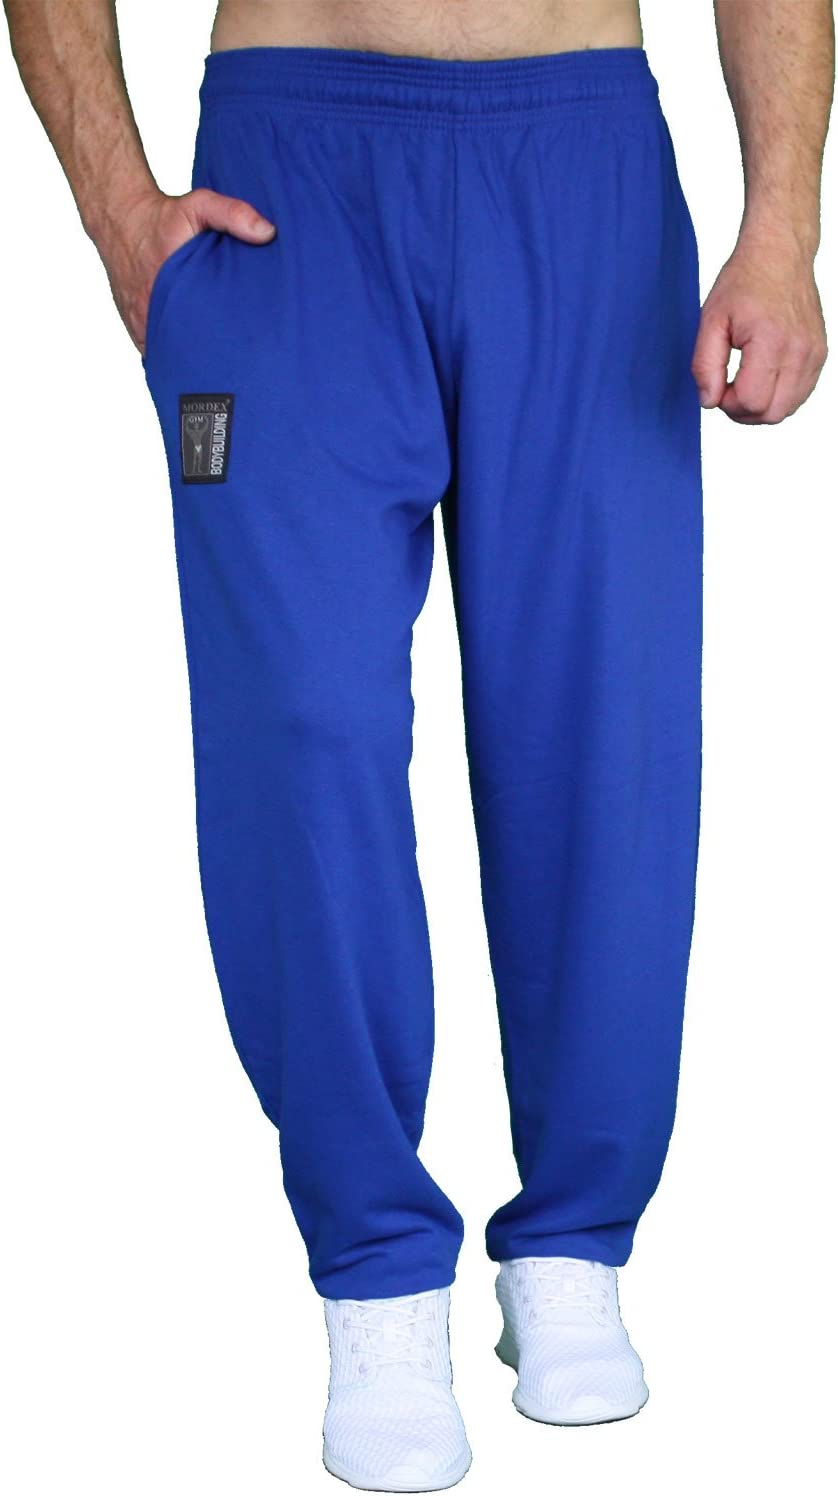 blaue 3//4 BW Bodybuilding Fitnesshose Sporthose Freizeithose MORDEX